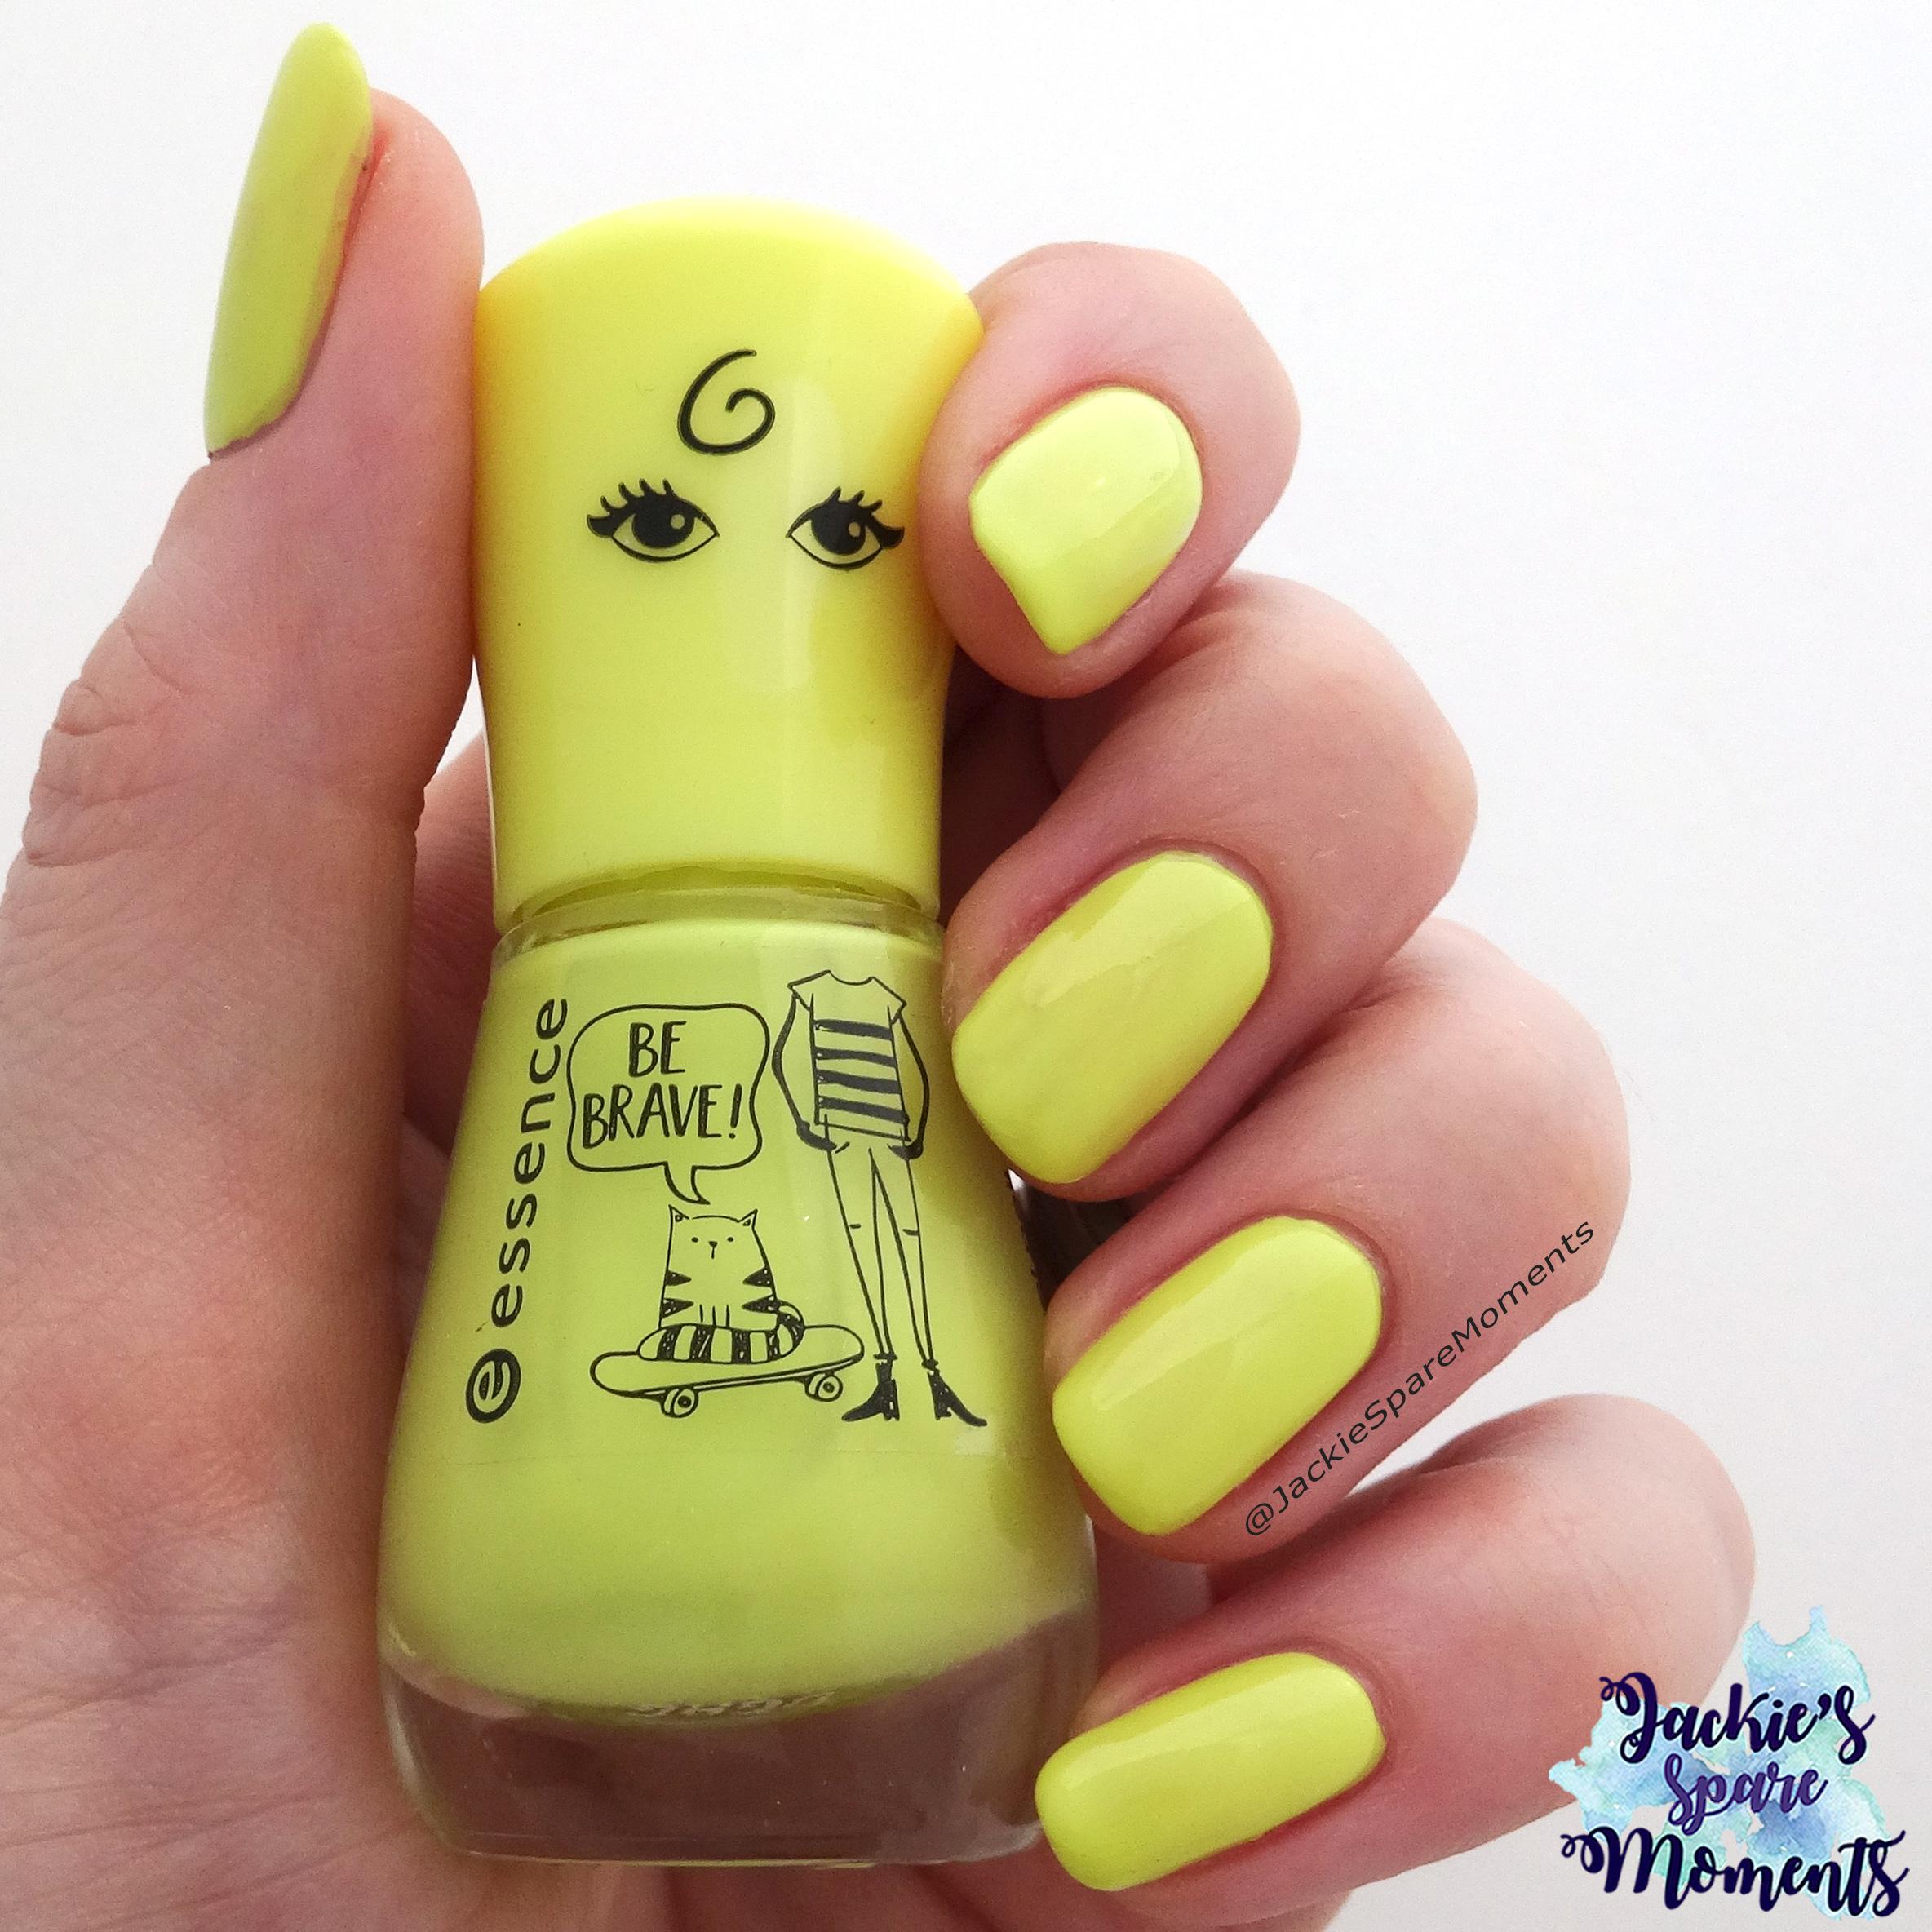 essence the gel polish 114 my highlighter as Pantone limelight